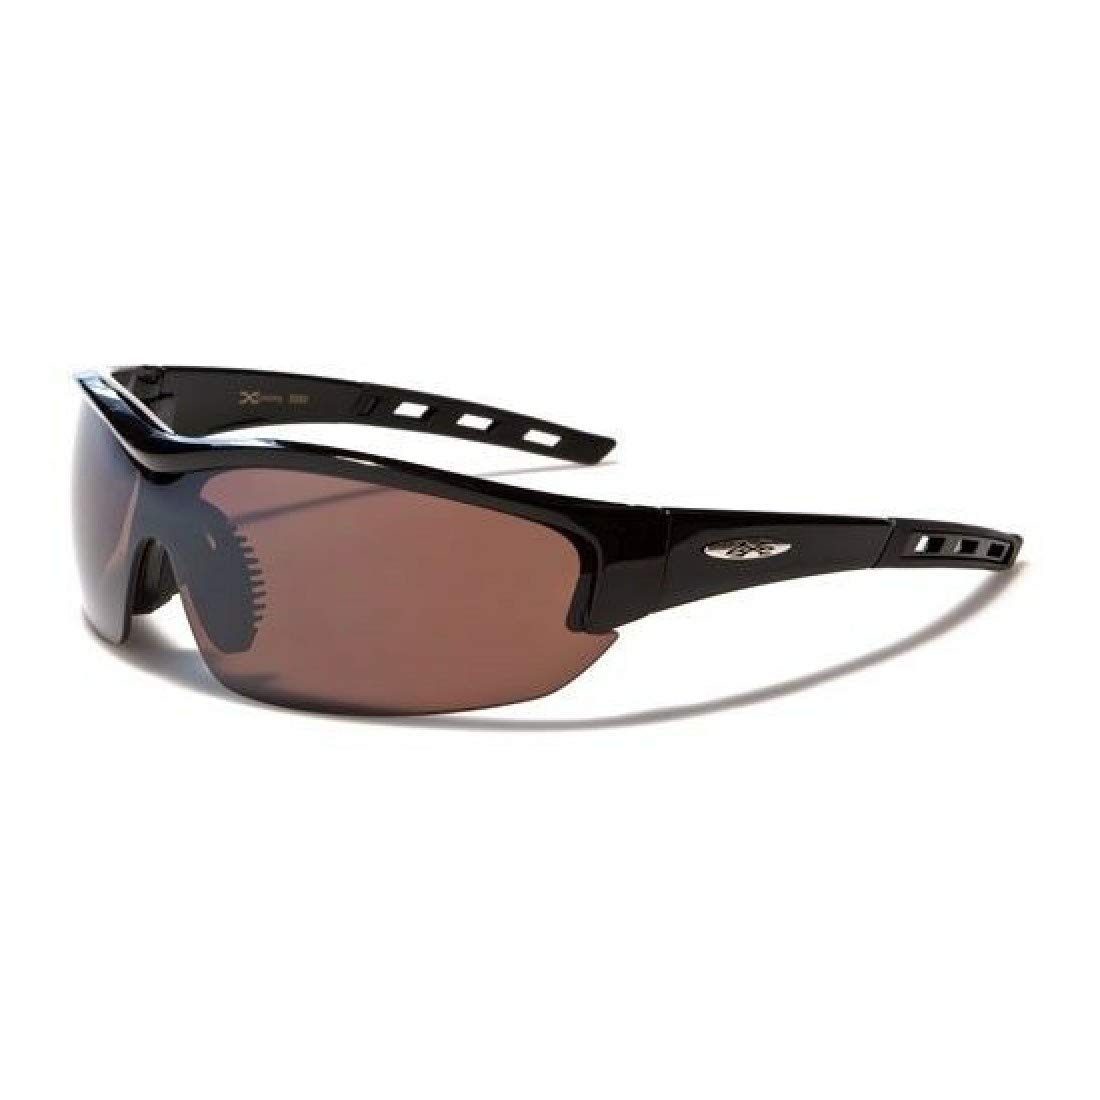 X-Loop Semi-Rimless Mens Shield Style Sport Sunglasses